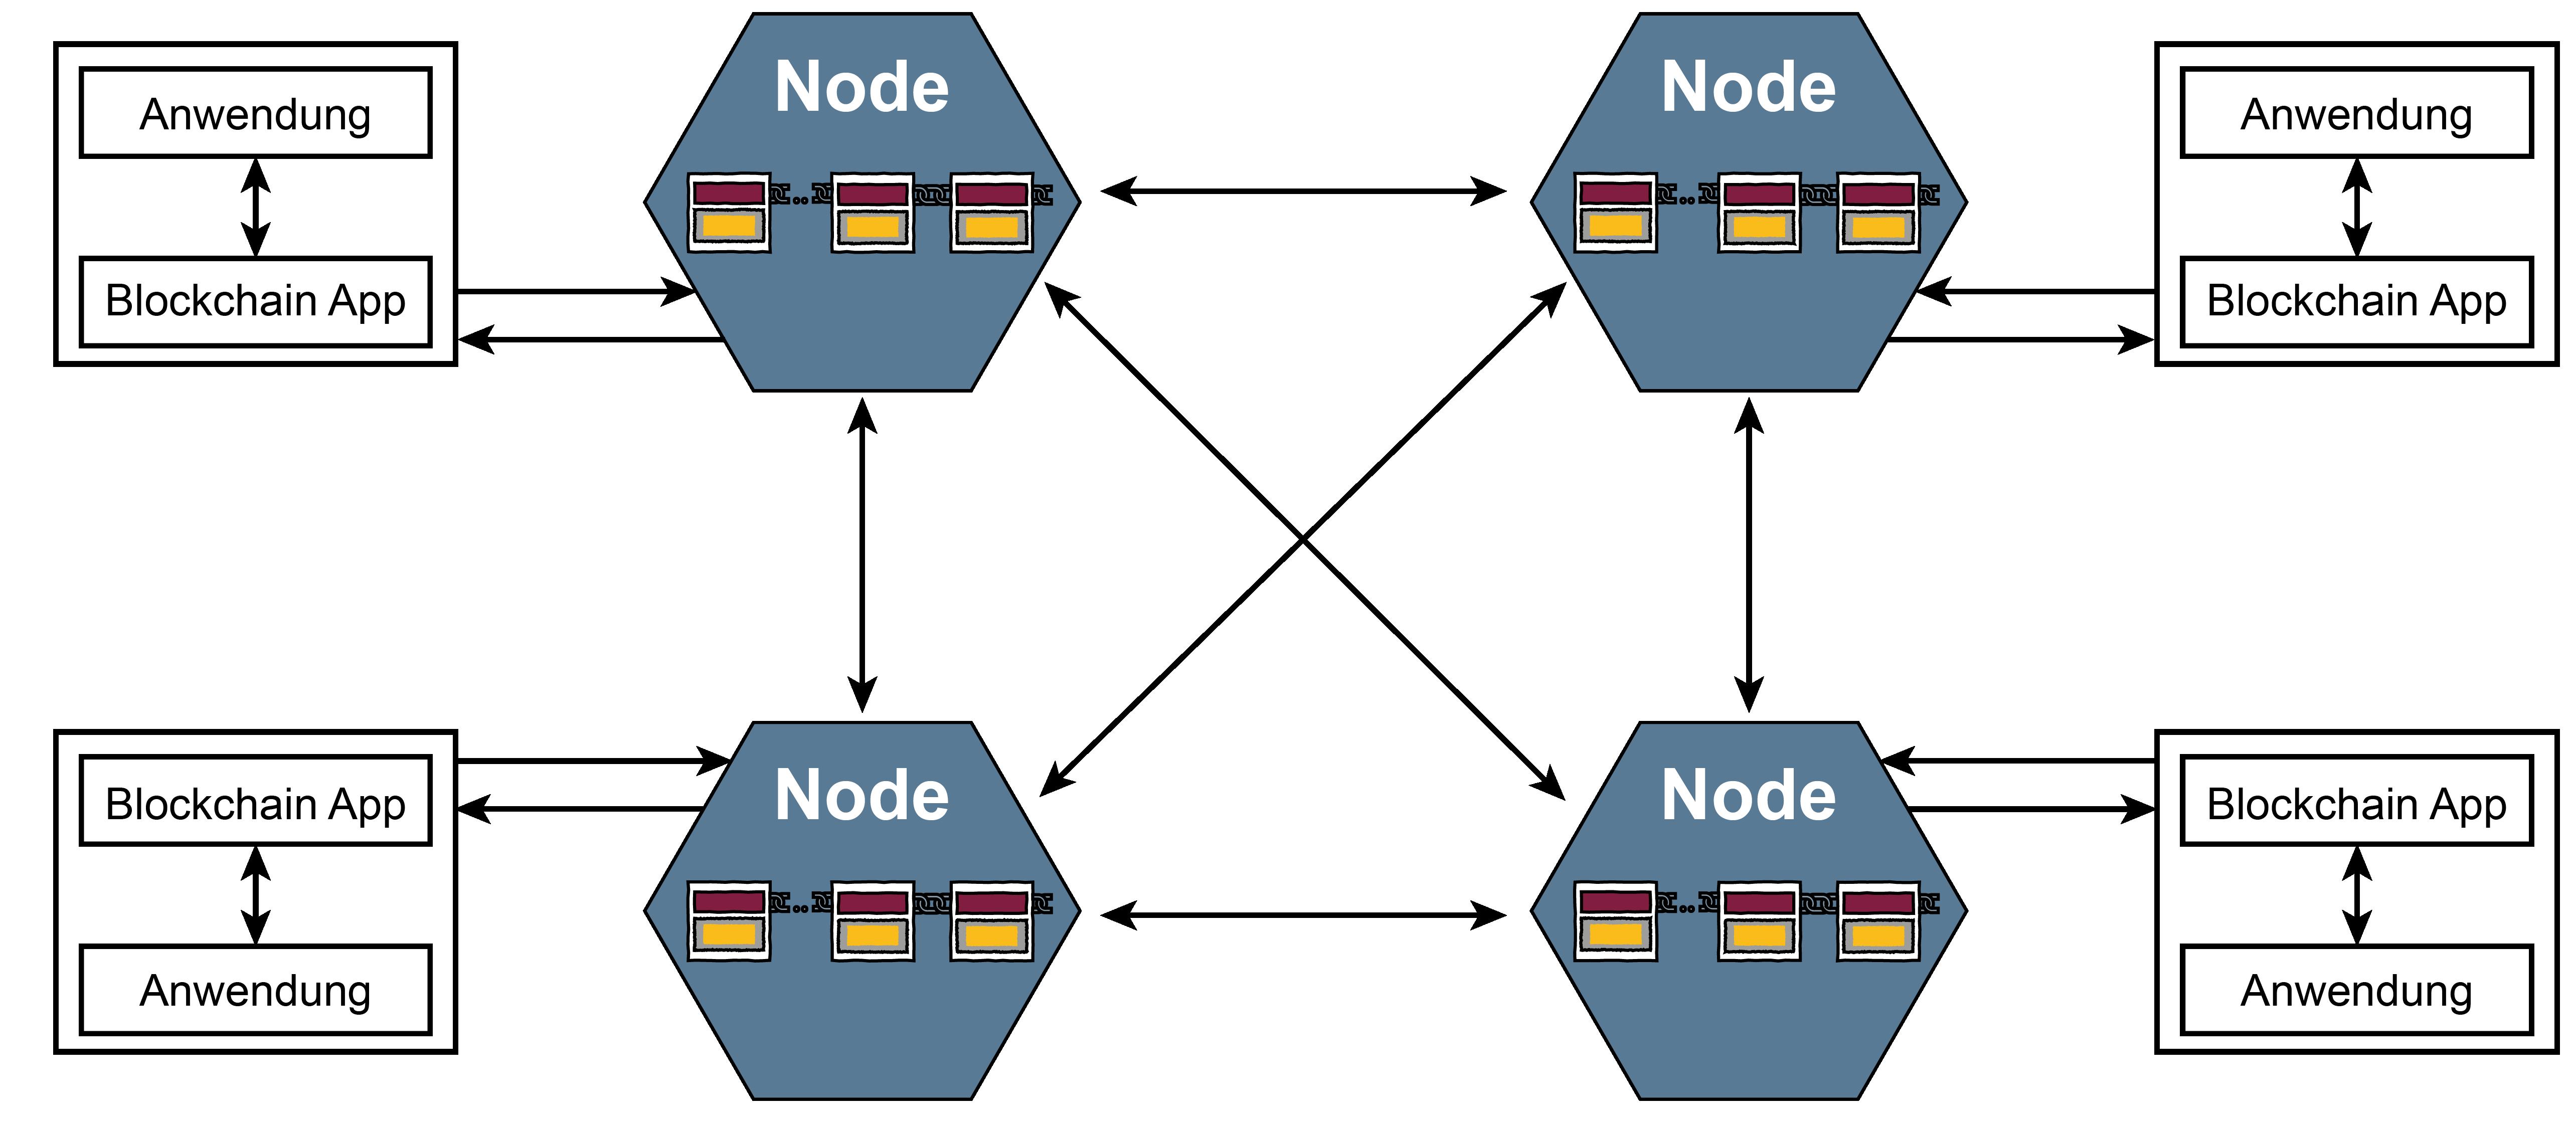 Blockchain-Technologie – Glossar Cyber-Sicherheit – Prof. Norbert Pohlmann